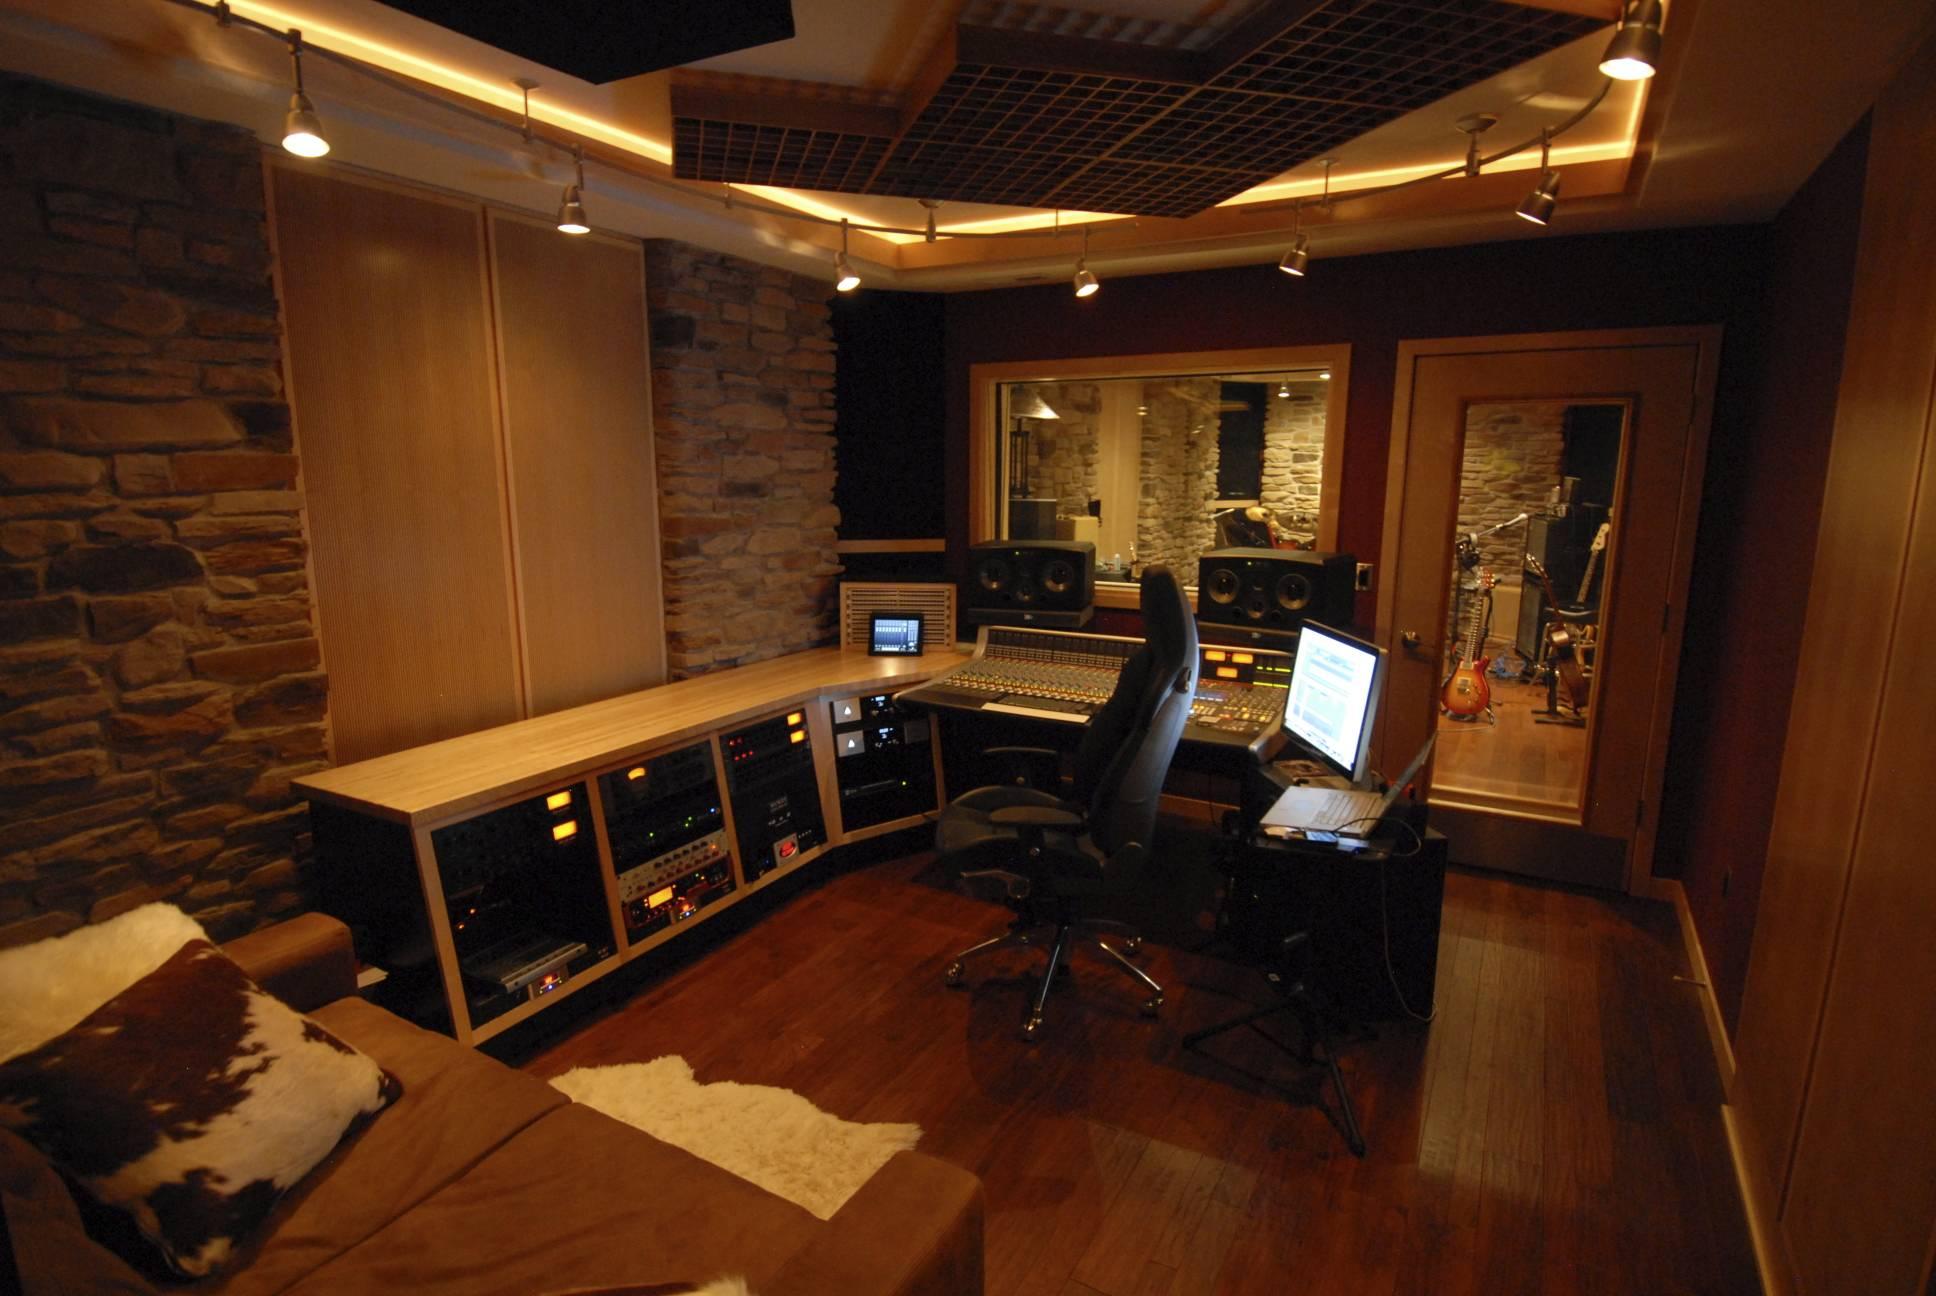 Grendels Lair Studio 7 Basement Project Page 5